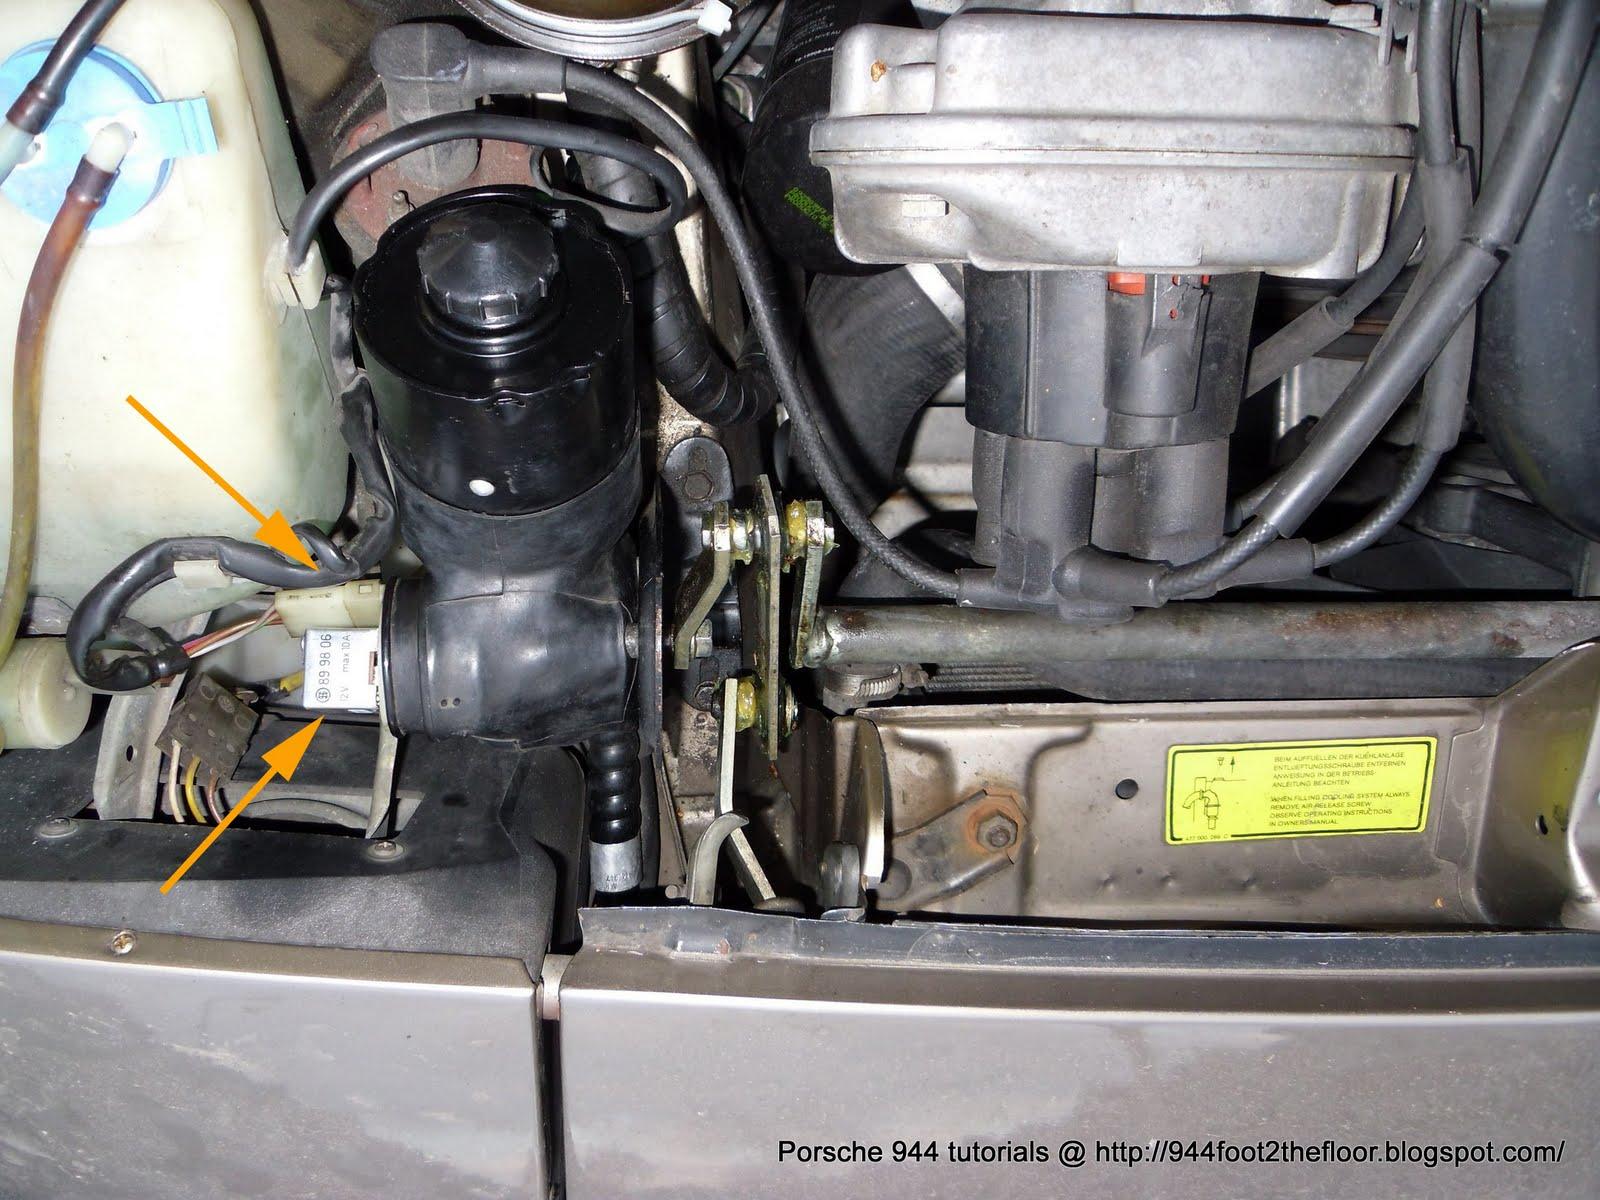 medium resolution of 944 foot to the floor how to troubleshoot porsche 944 porsche 924 engine diagram